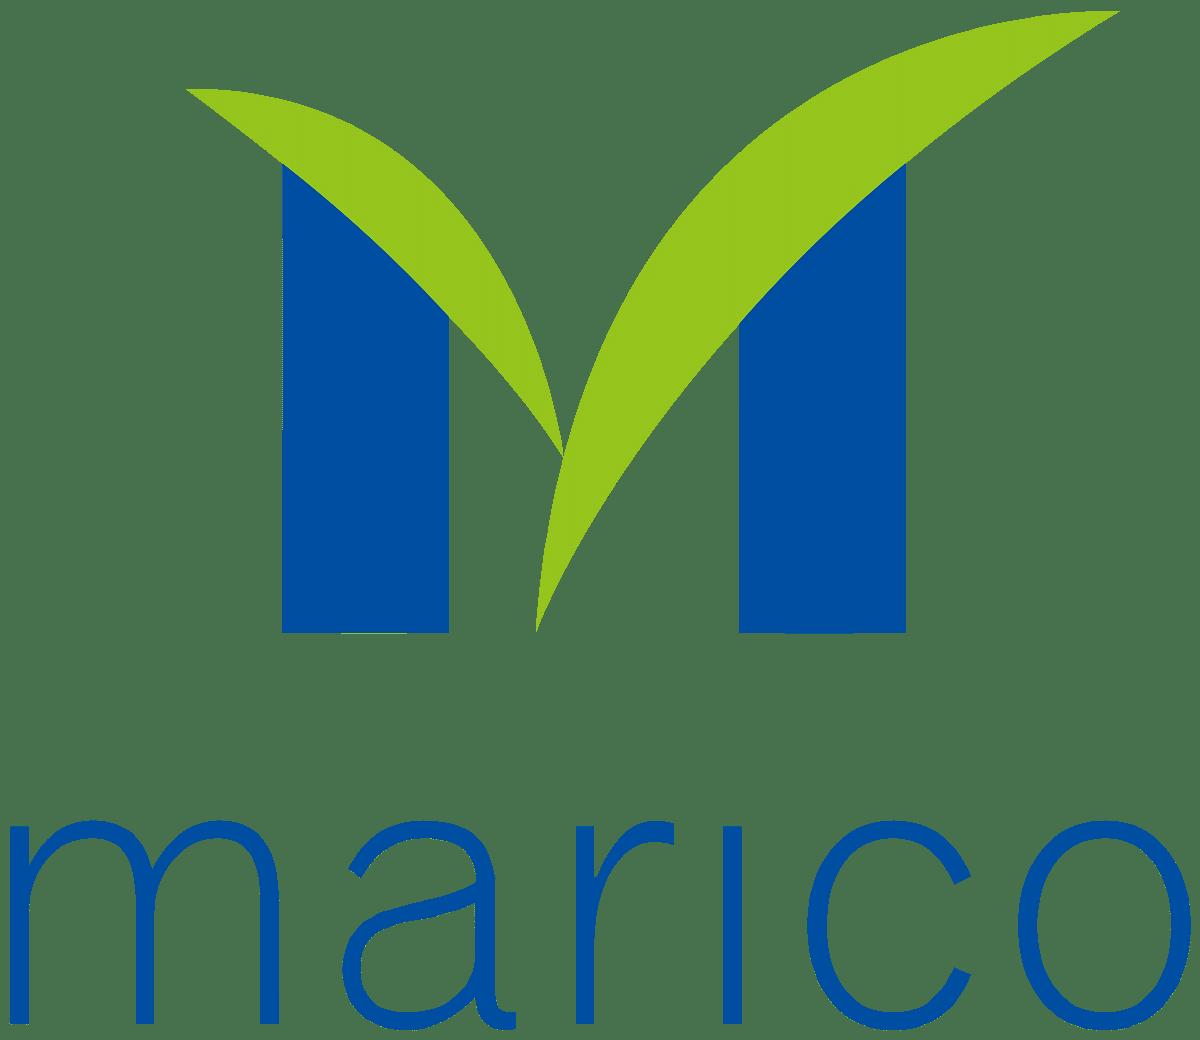 Marico Q1 Review - Rich Valuations Warrants Caution: Prabhudas Lilladher